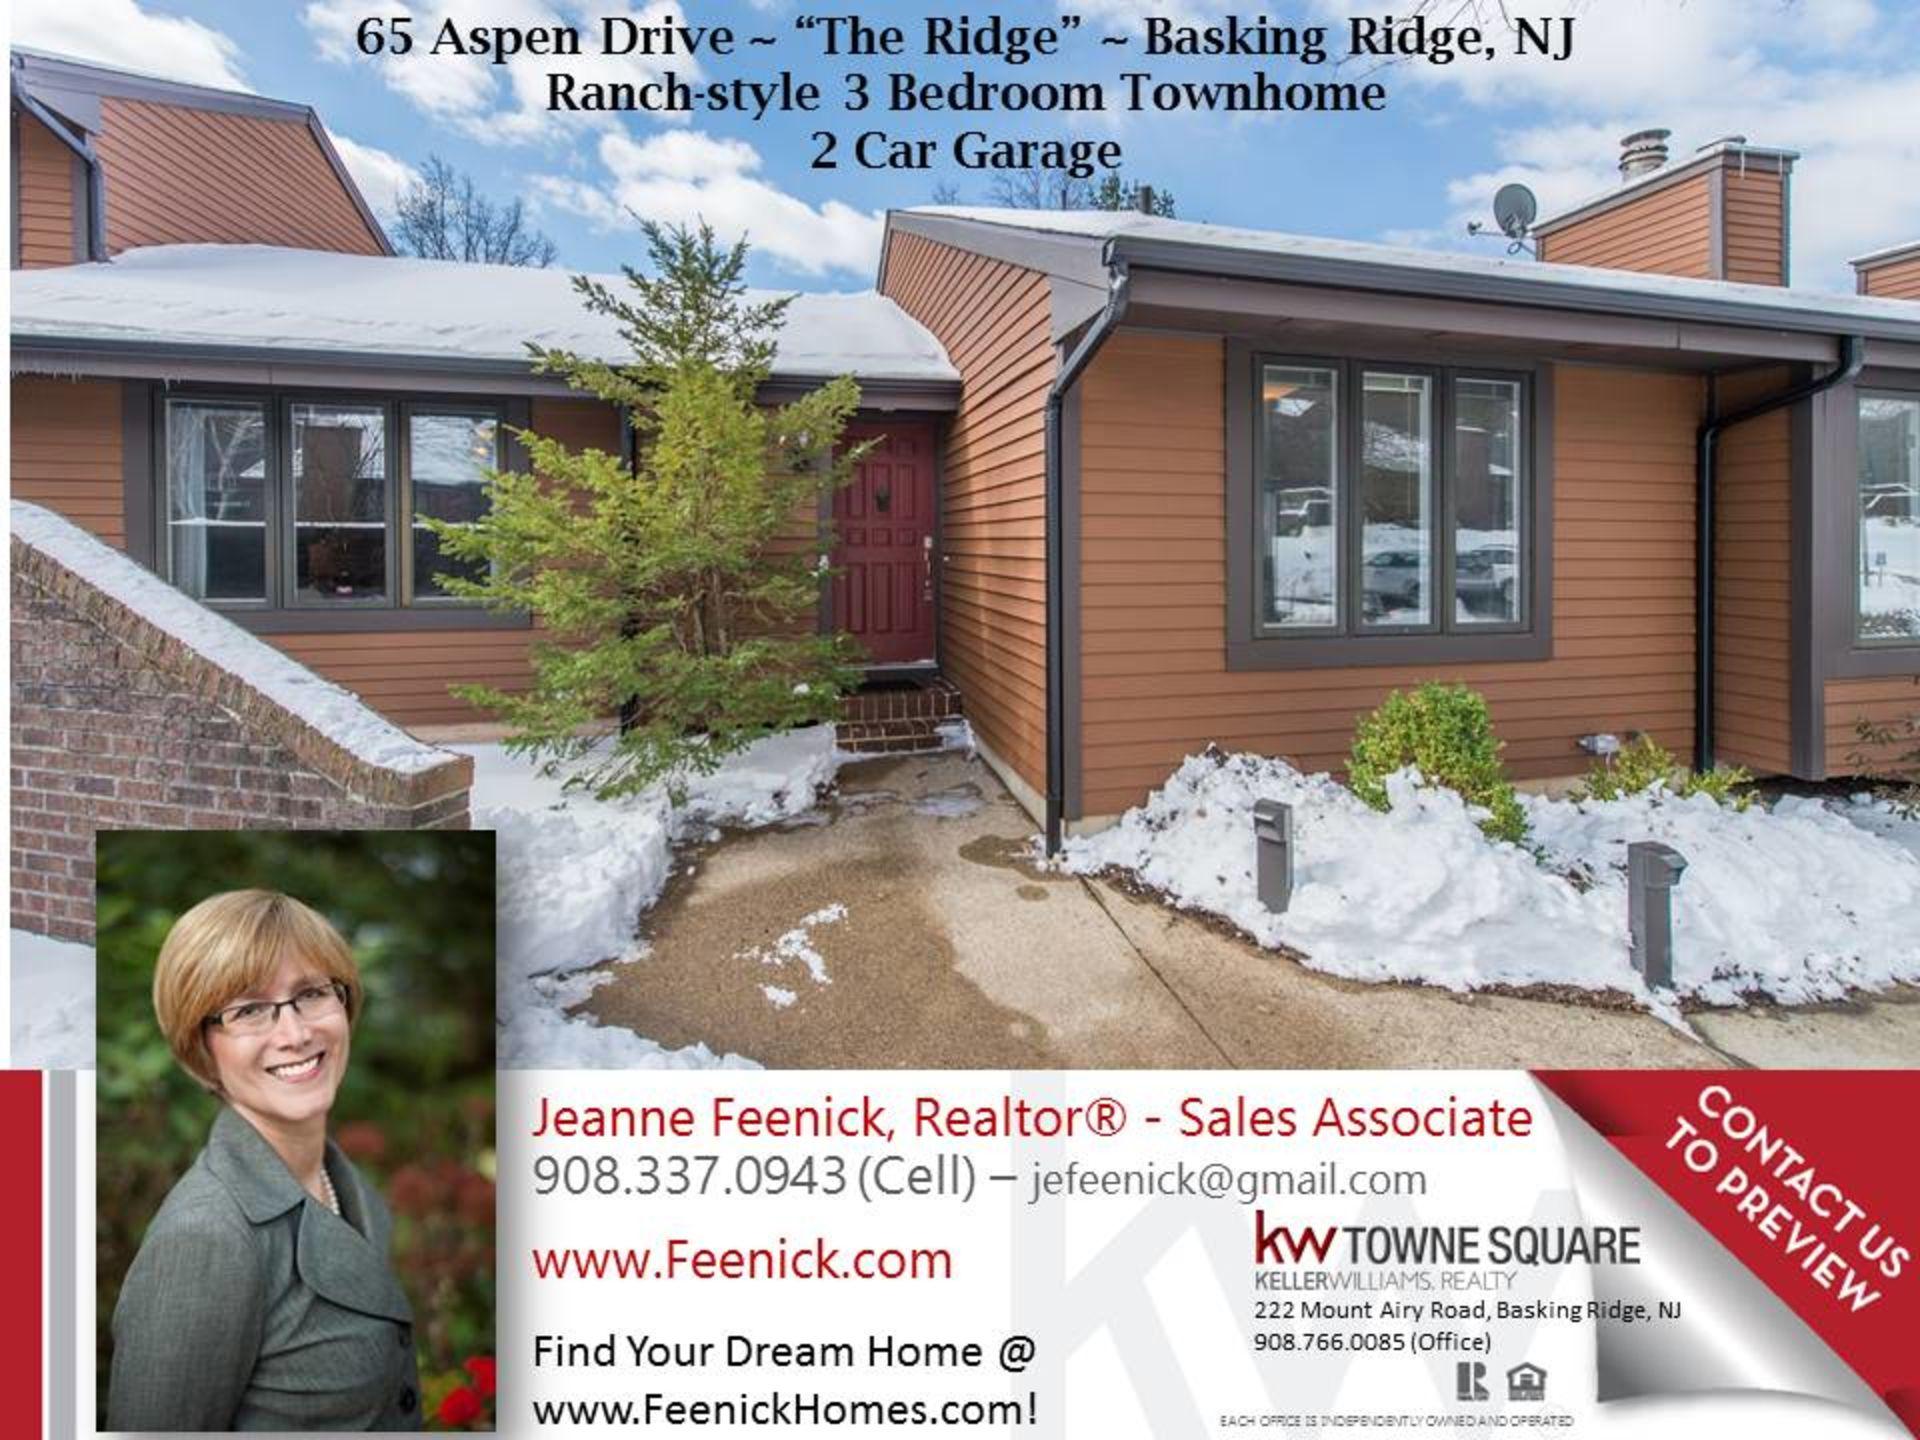 Two fantastic new listings in Basking Ridge